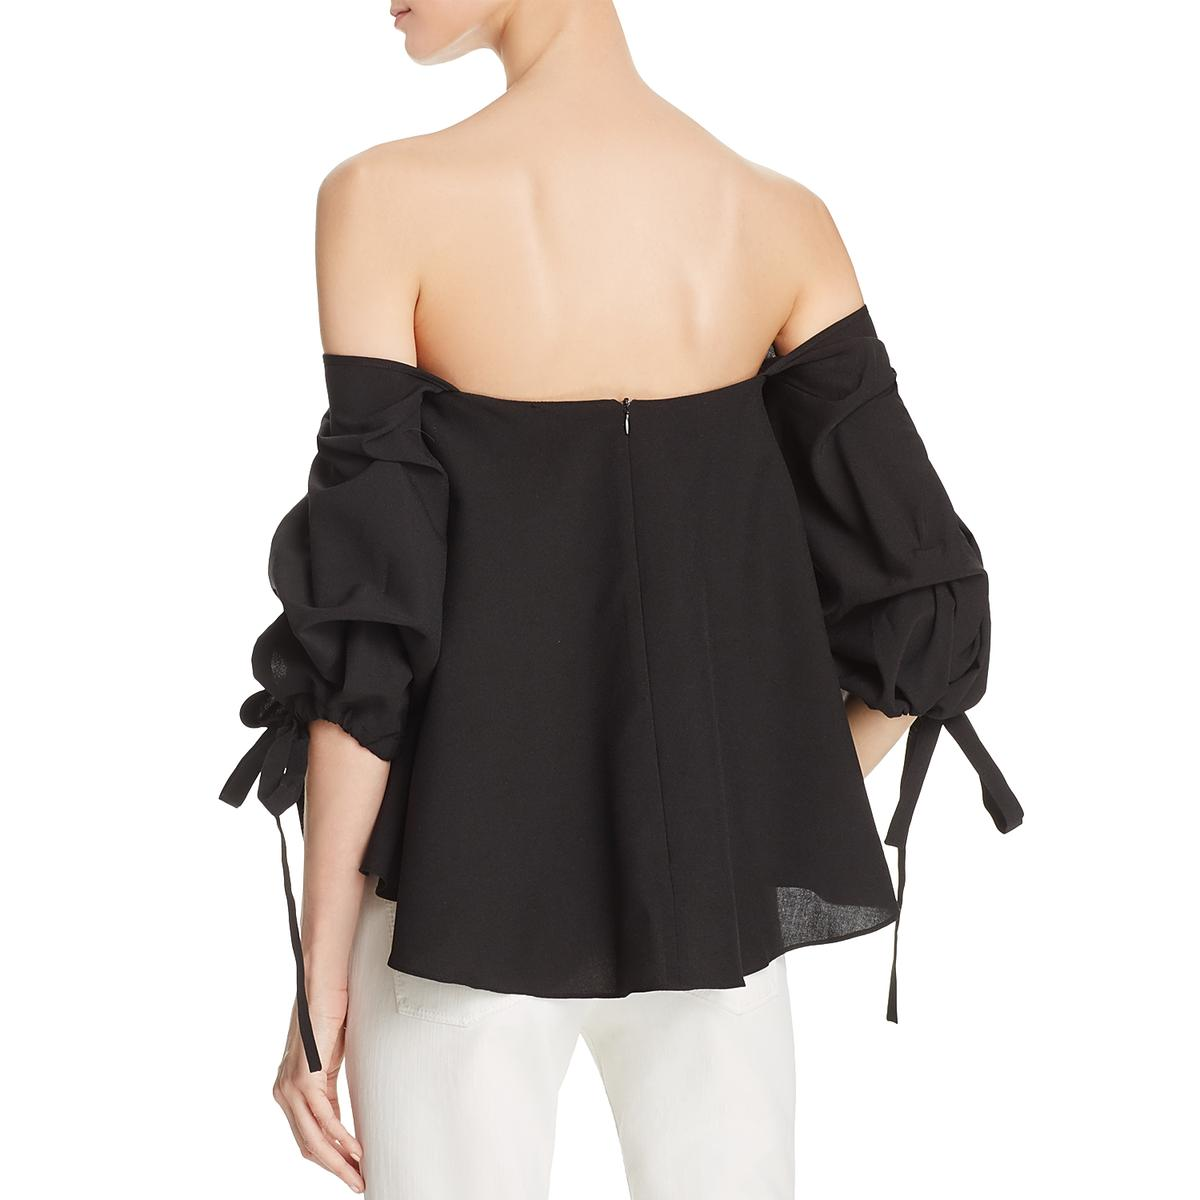 Neckline Sweetheart Sleeves Womens Shirt Bhfo Be Ruffled Crop 1889 Do Top xUIXqx